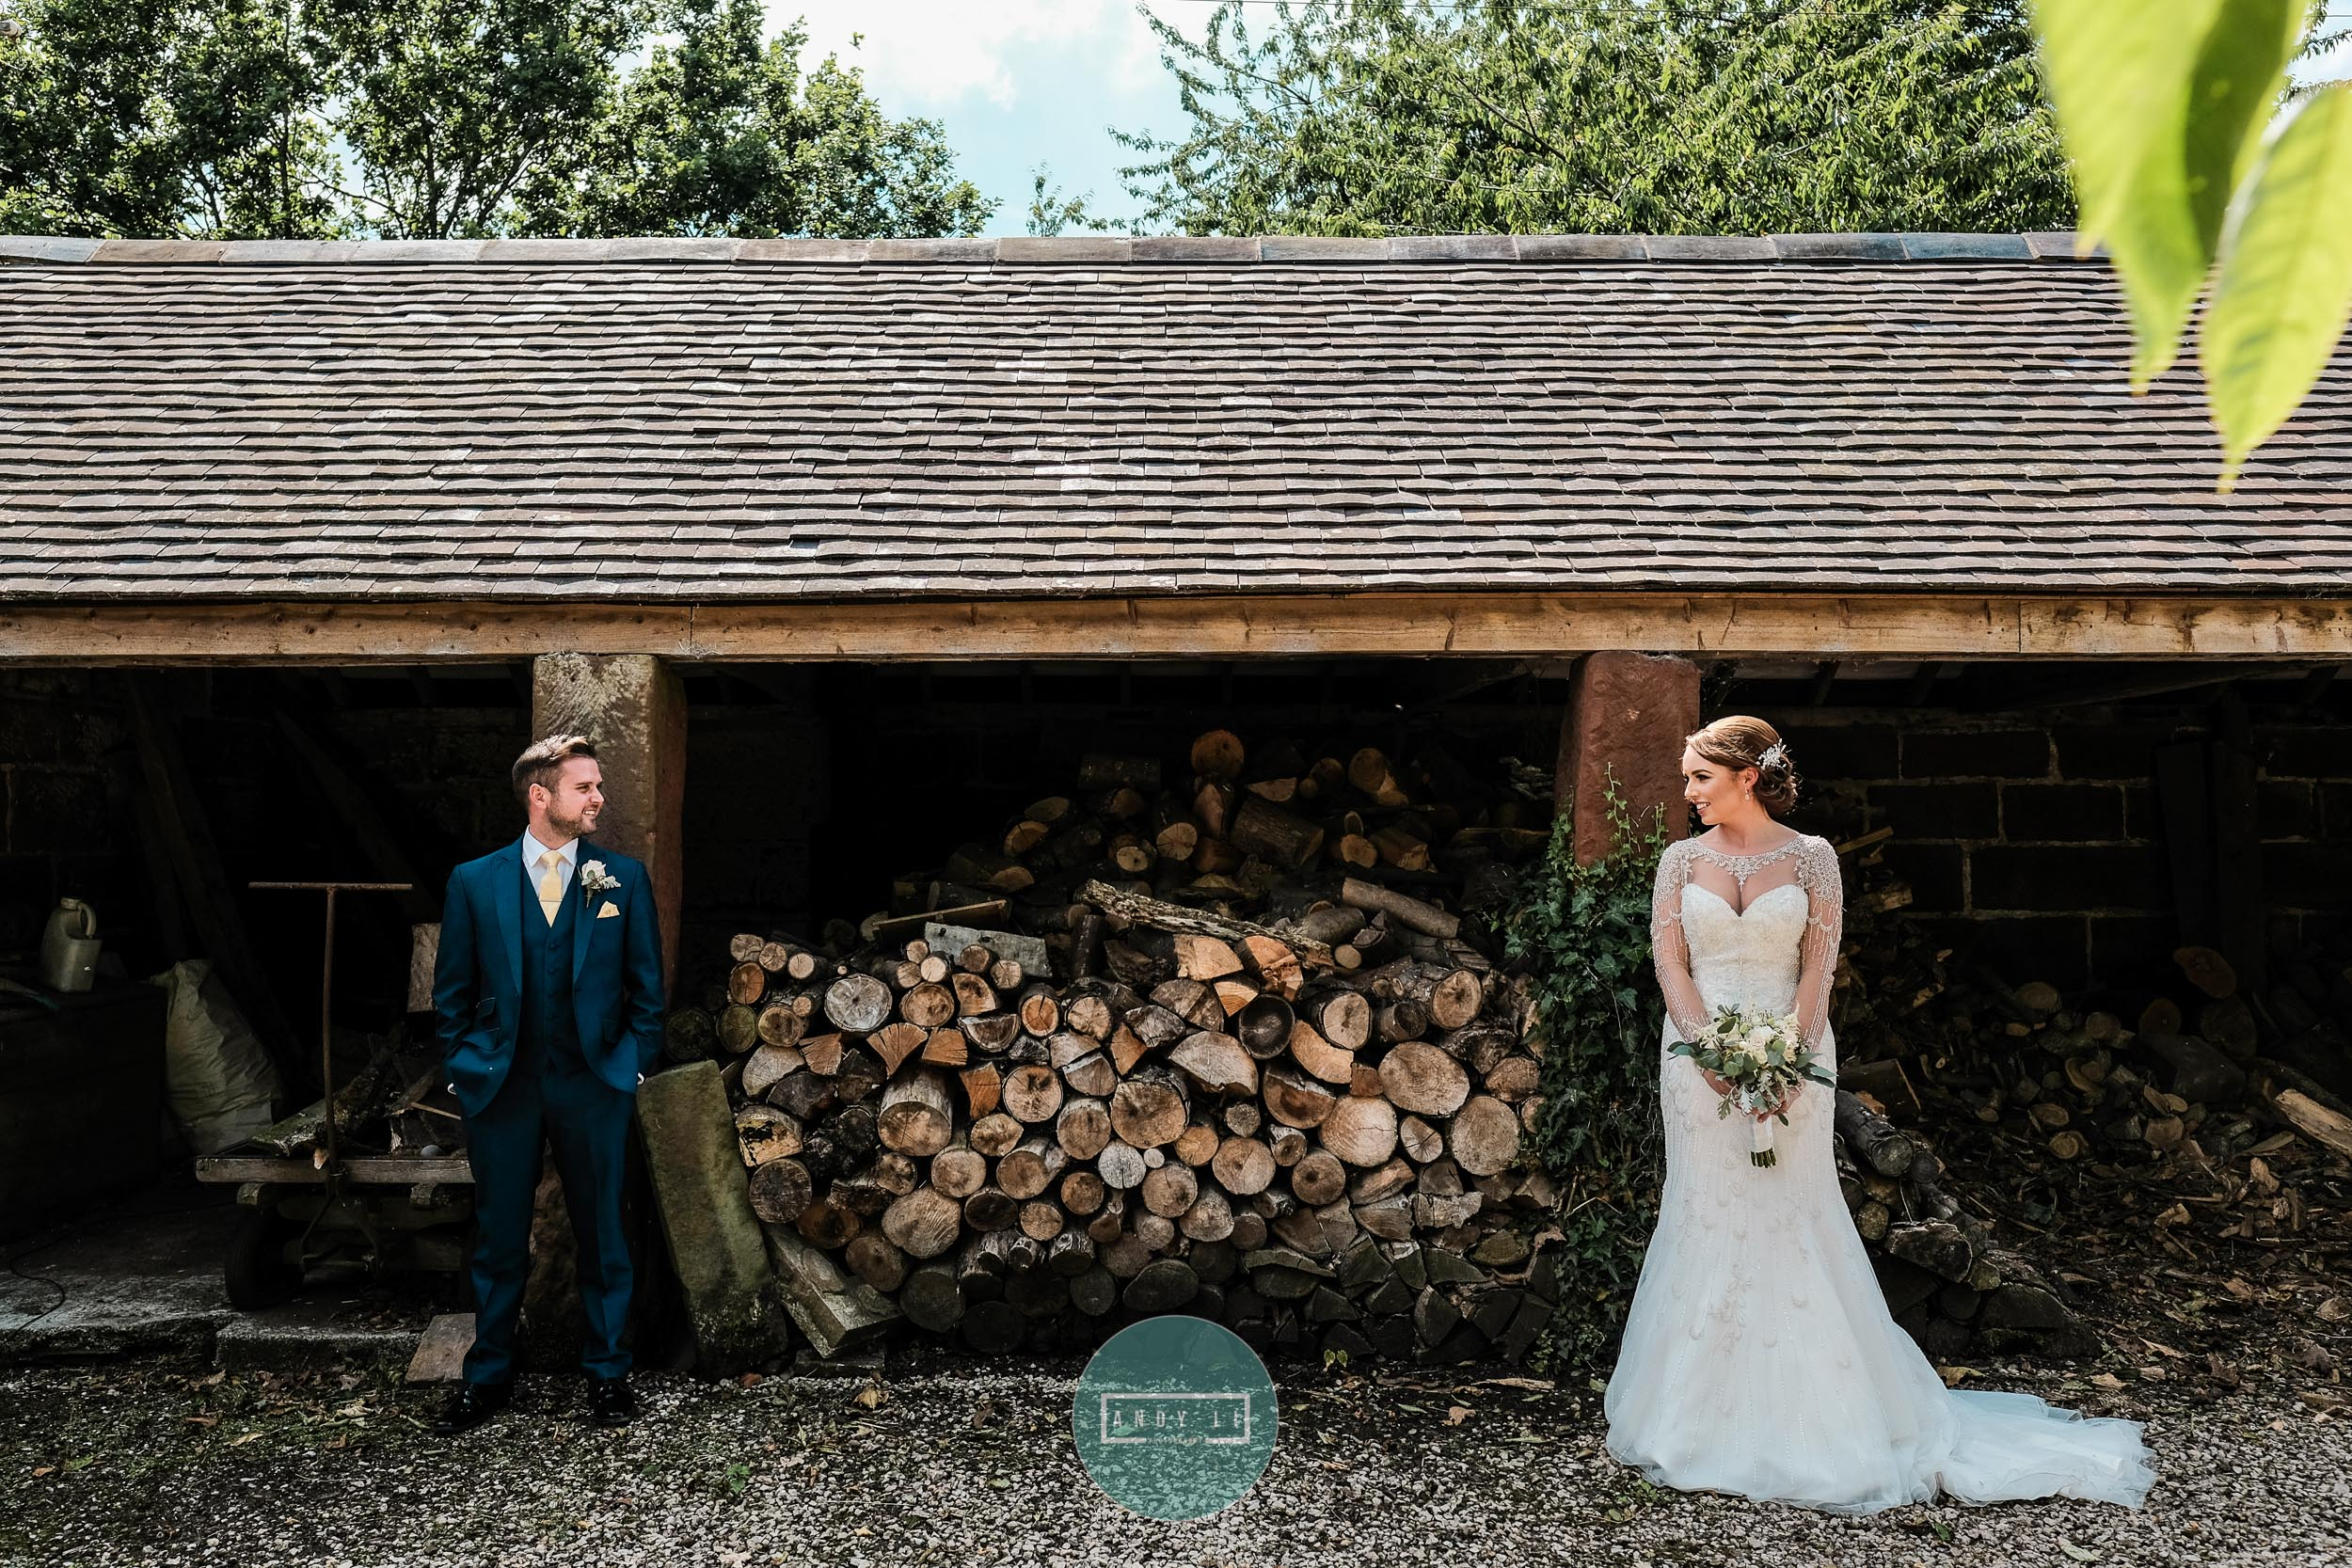 Pimhill Barn Wedding Photographer-079-XPRO6283.jpg